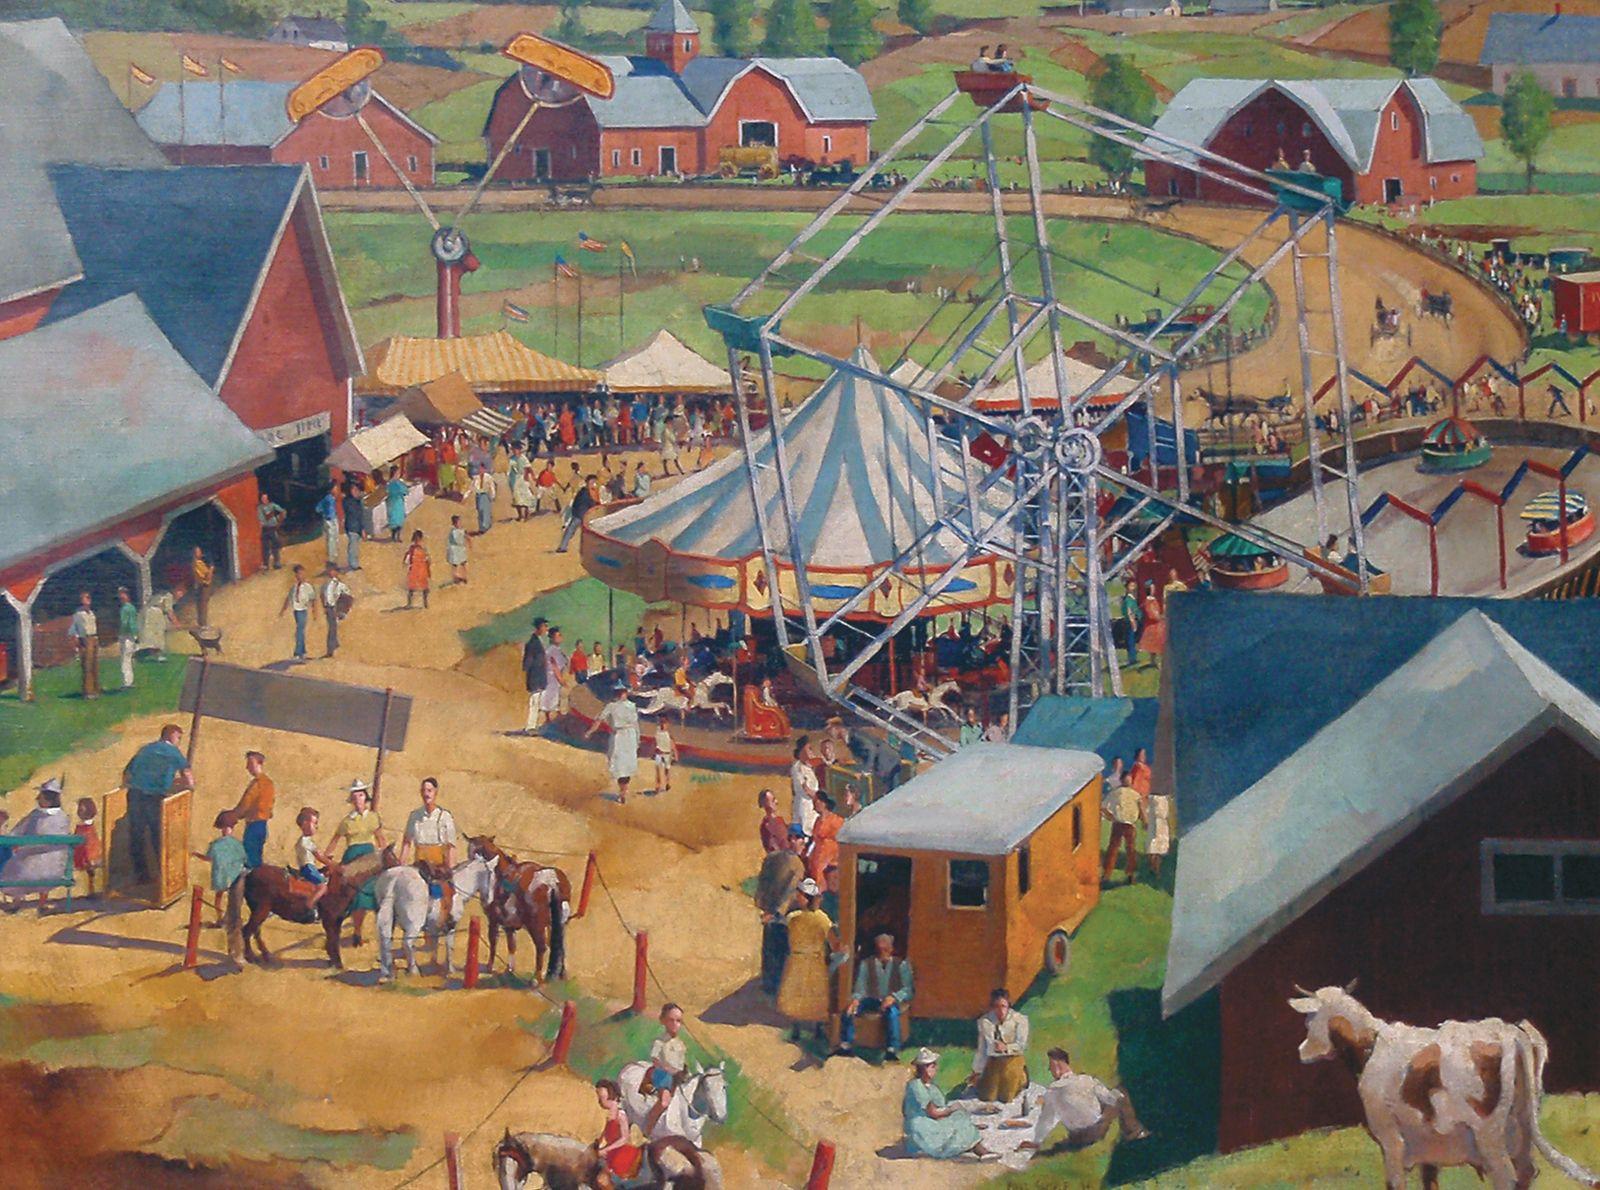 Paul Sample, Noon at the Fair